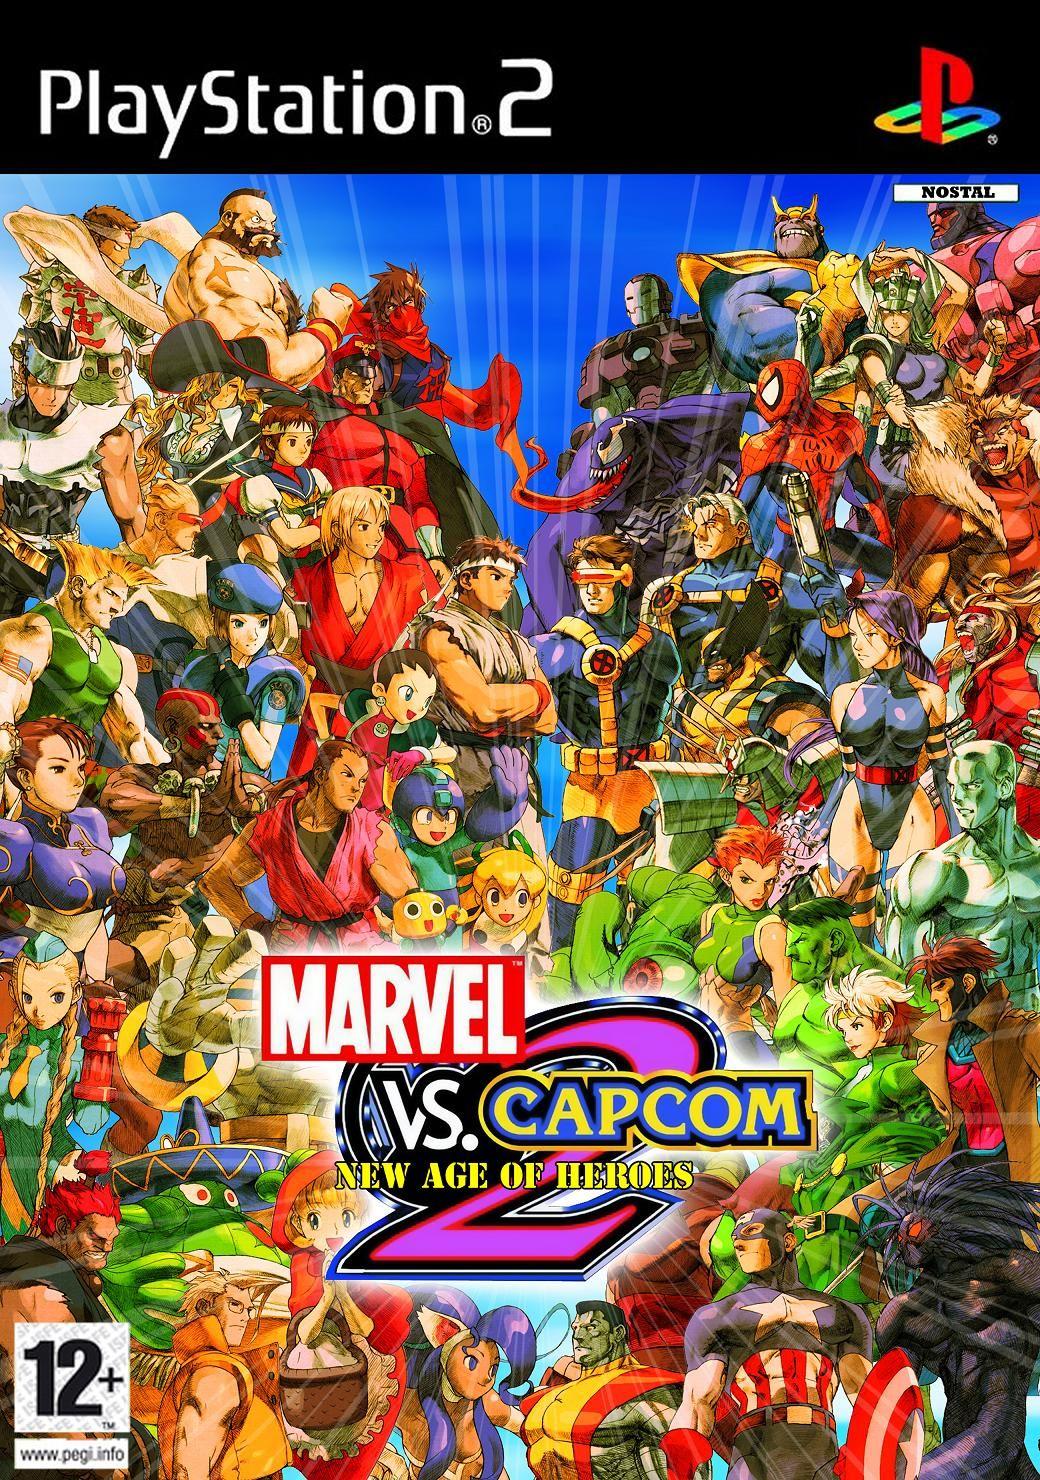 Marvel Vs Capcom 2 N Coverart By Nostal Deviantart Com On